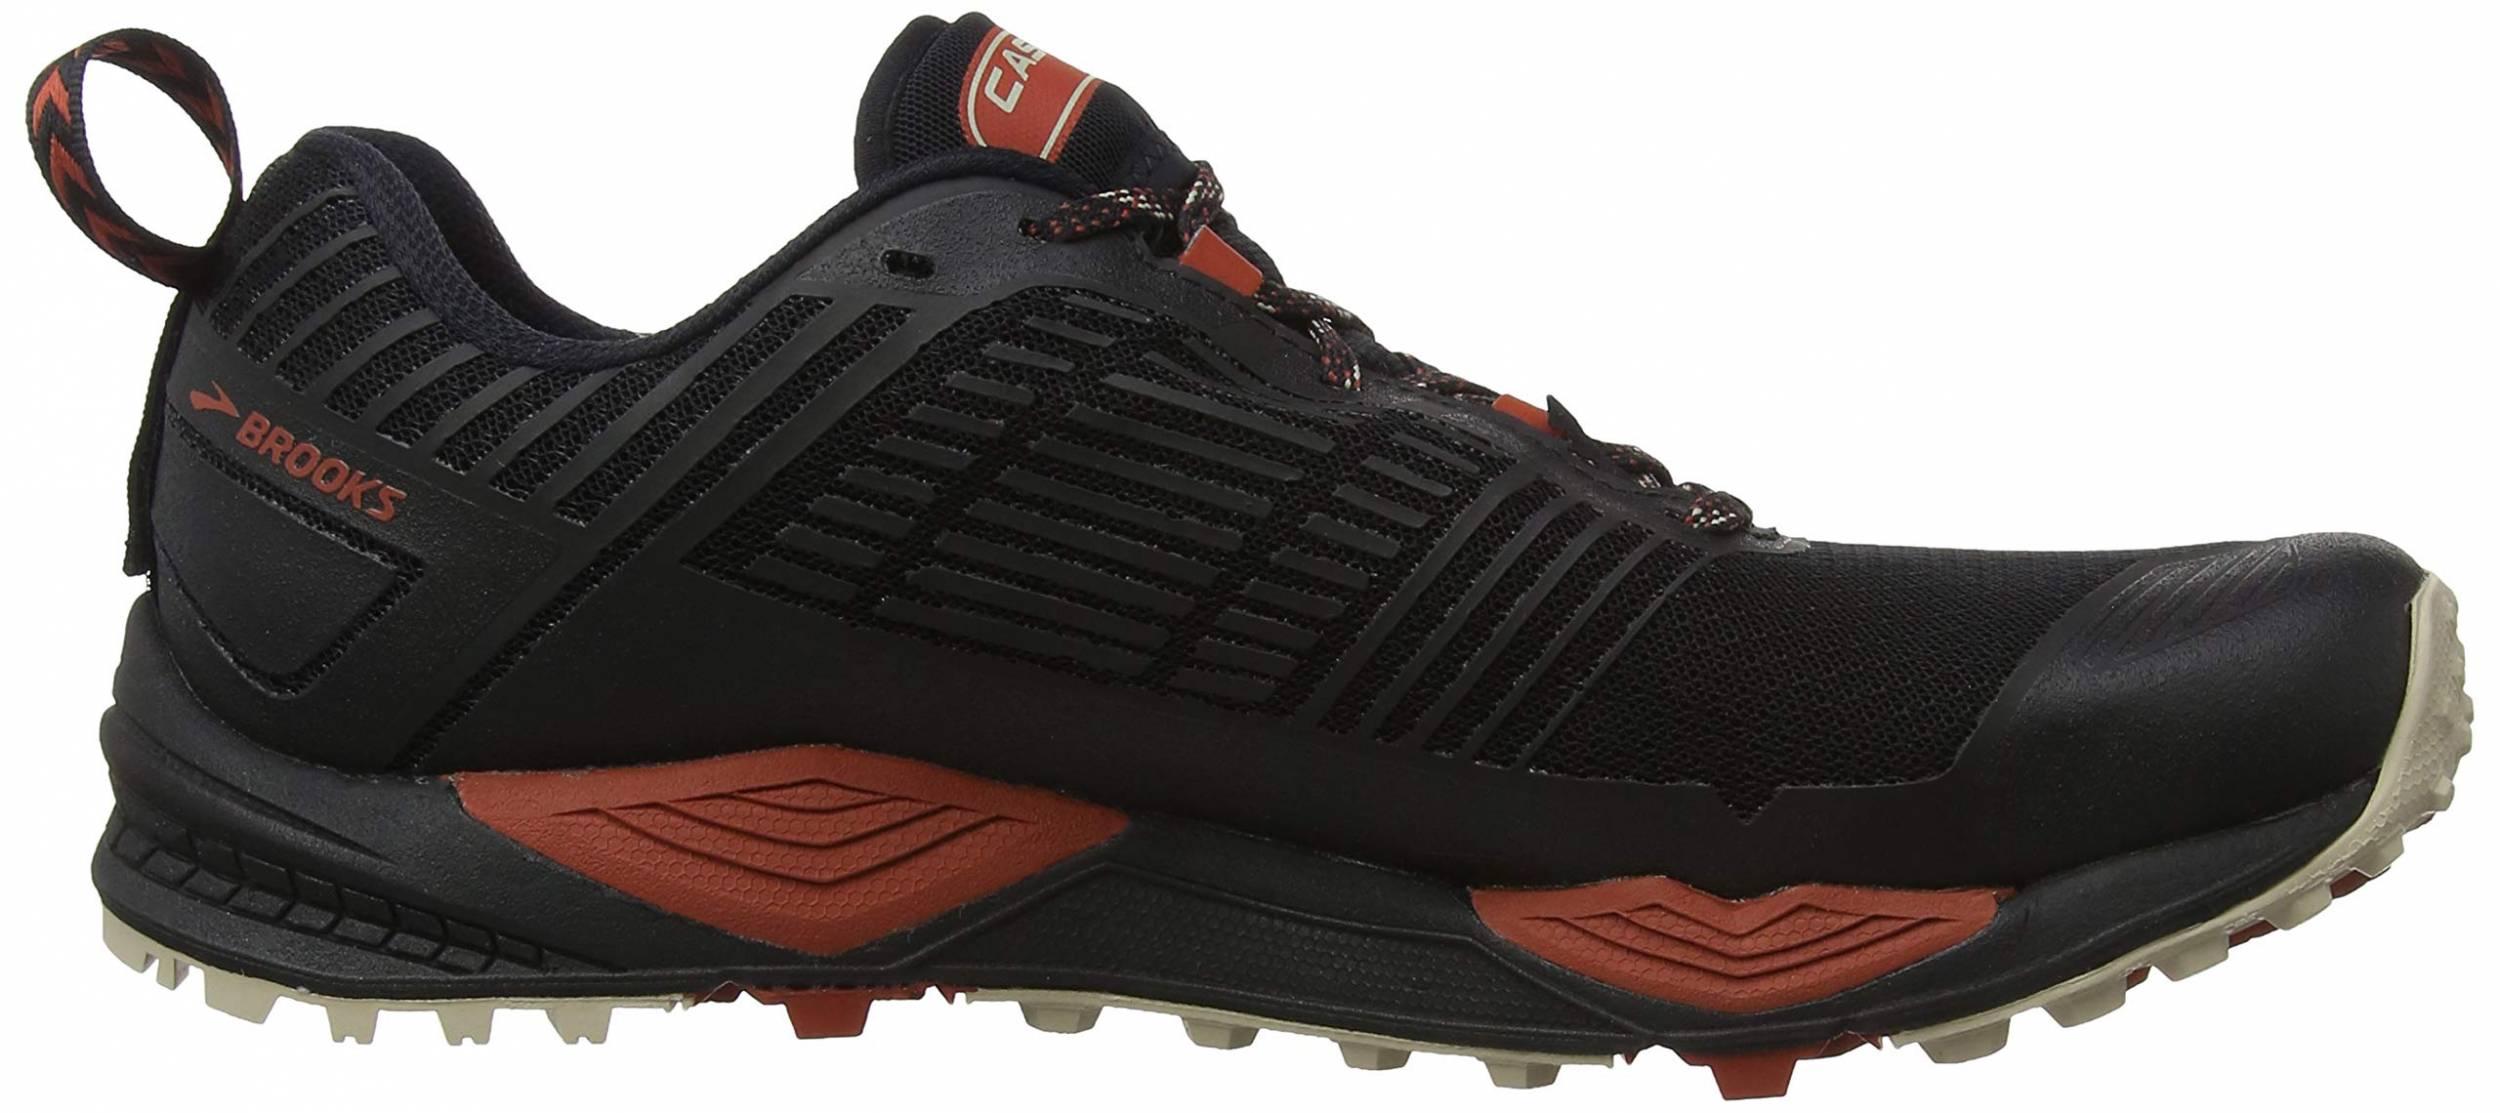 Brooks Waterproof Running Shoes